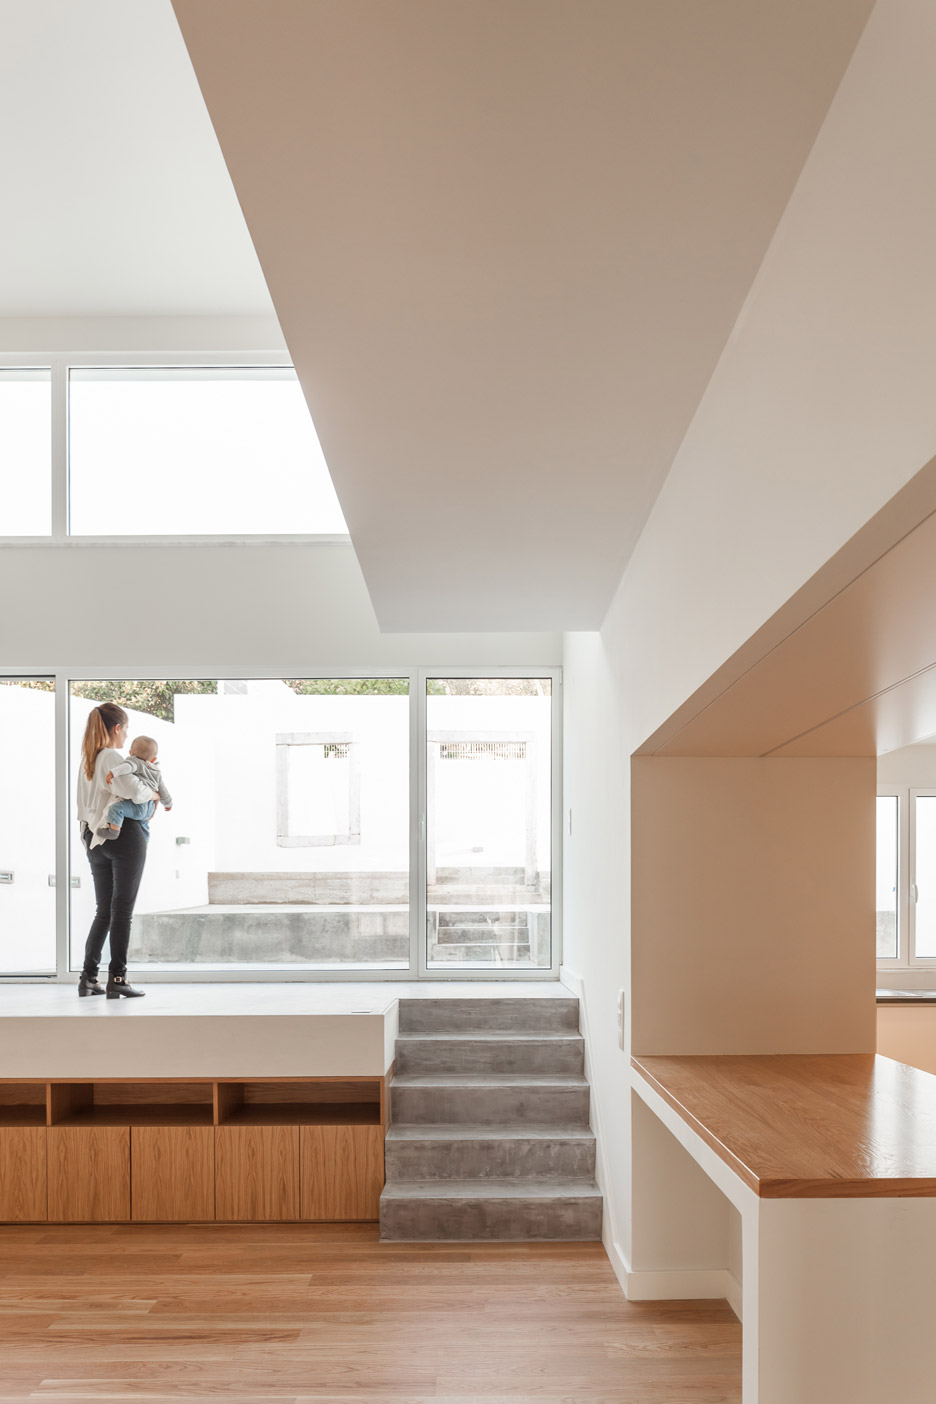 terras-8-house-casa-adjuda-colectivo-cais-belem-lisbon-portgual-house-renovation-francisco-nogueira_dezeen_936_21